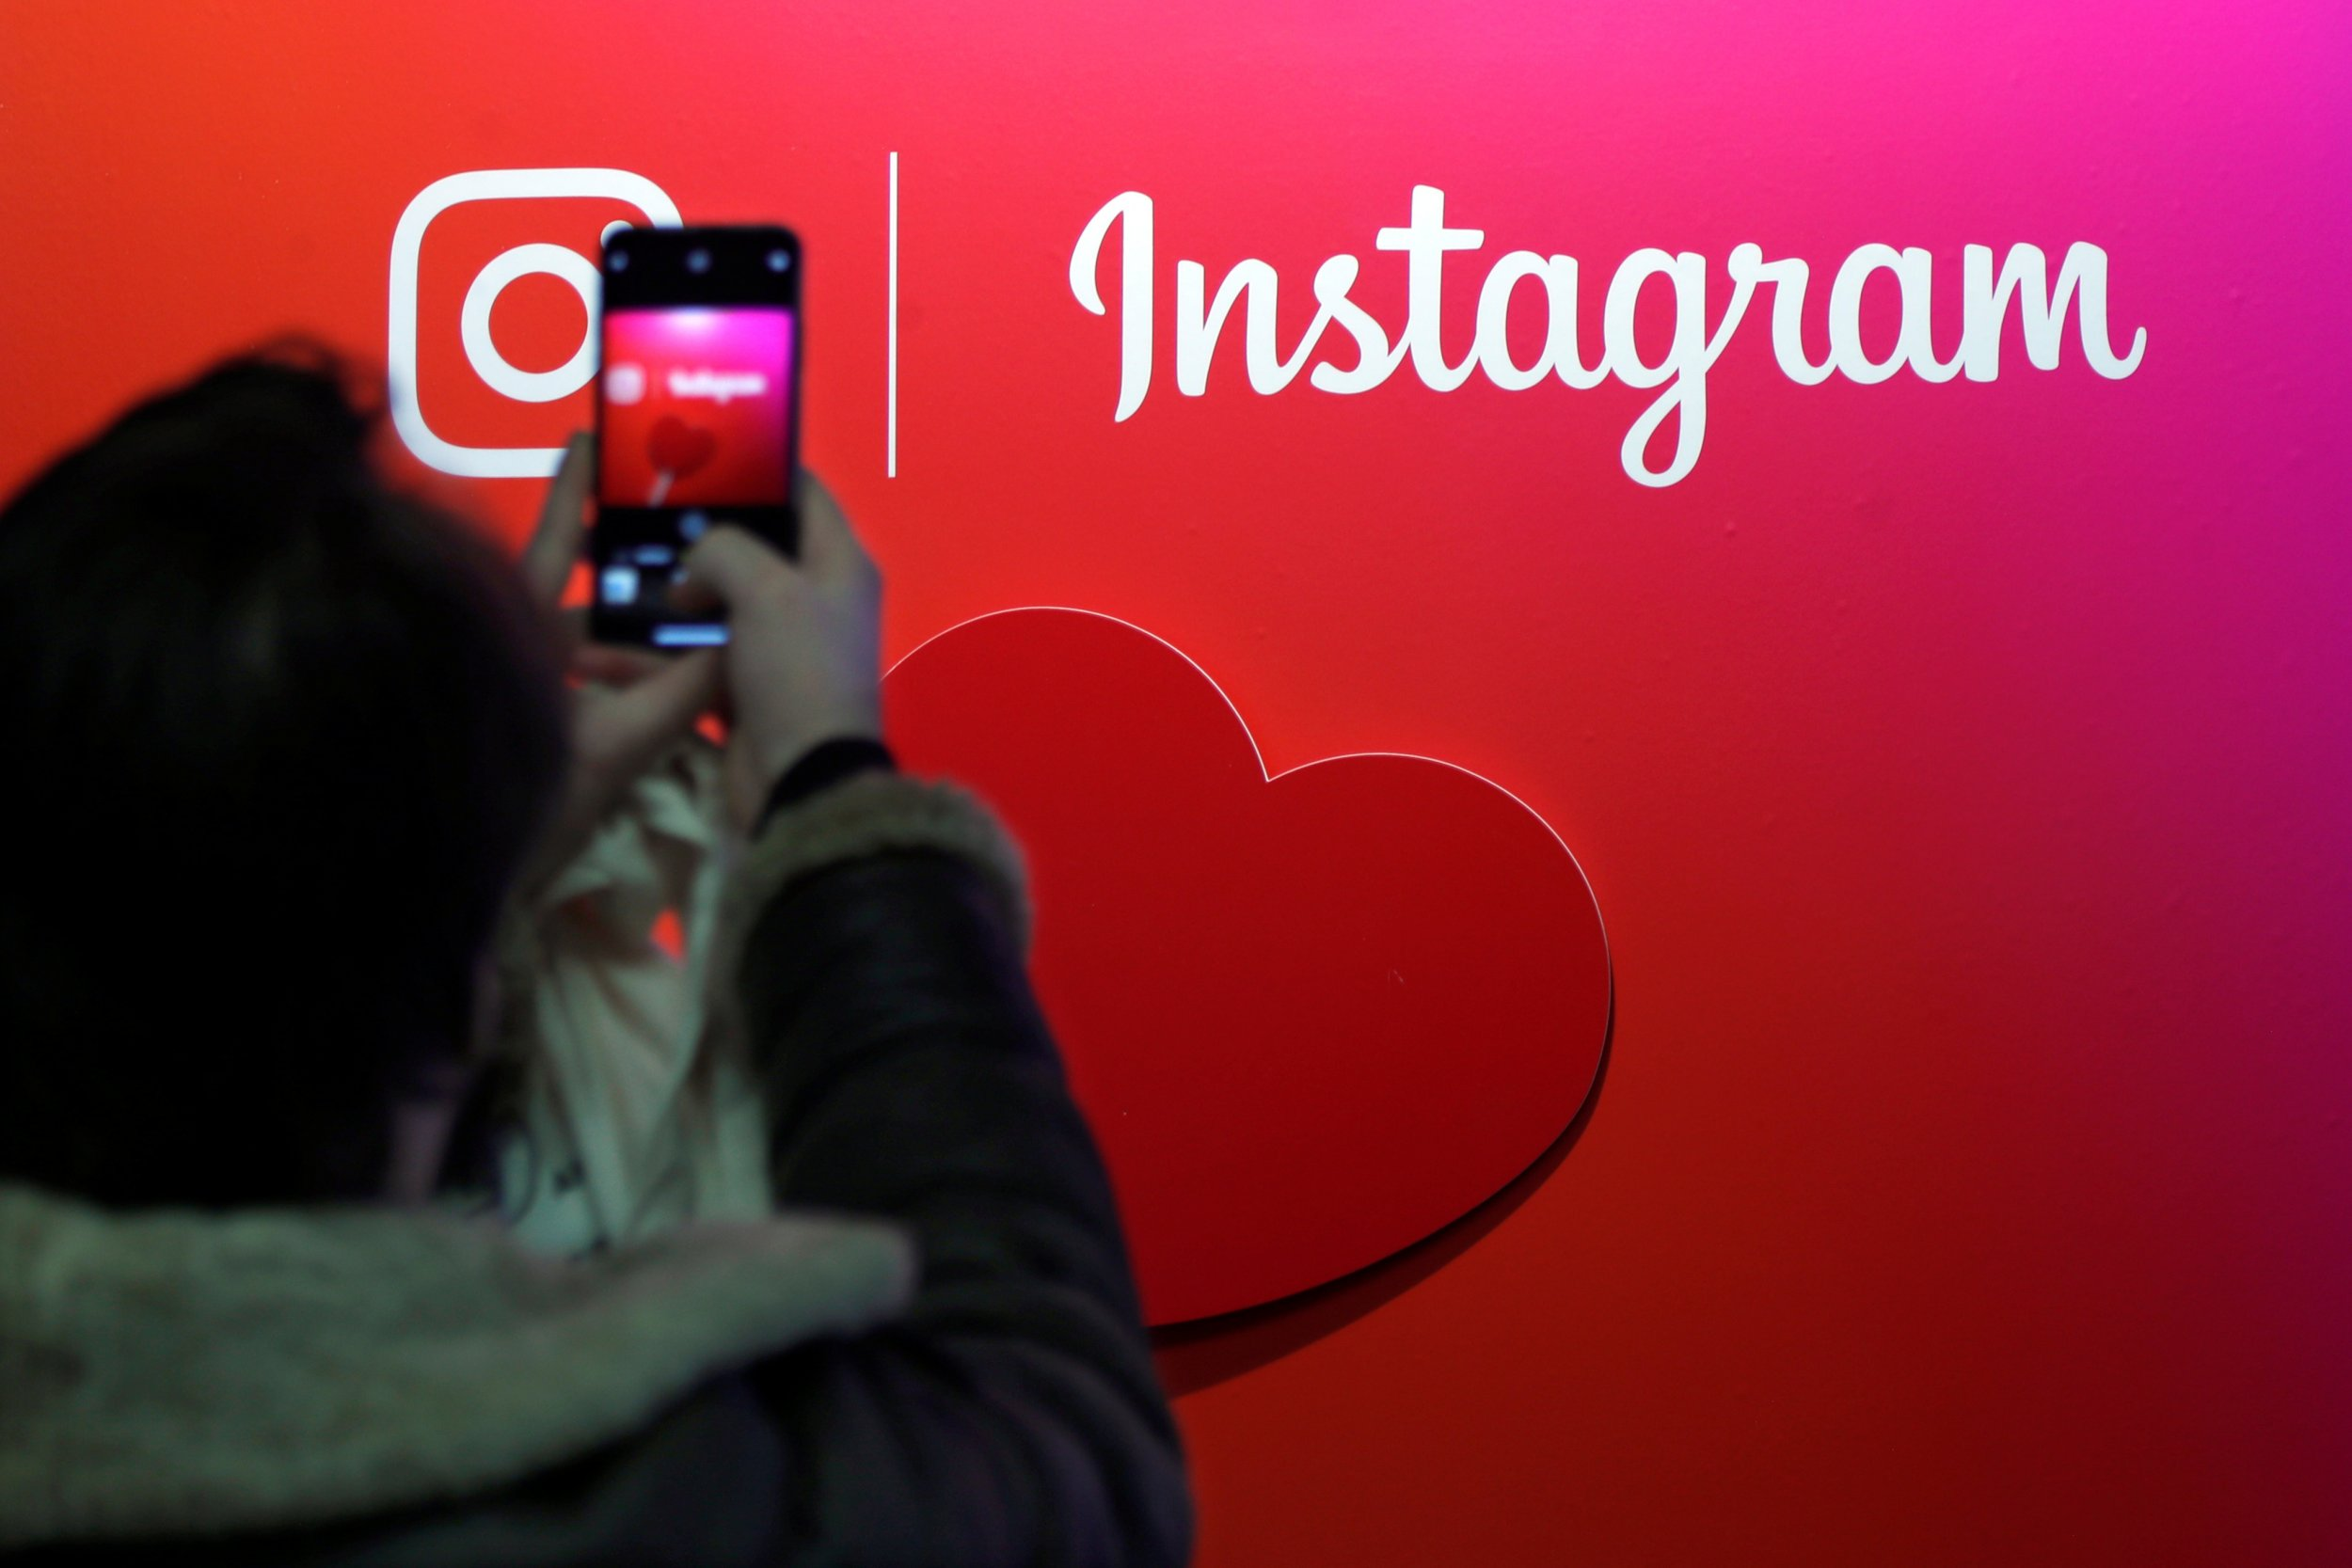 Instagram's IGTV app was caught suggesting